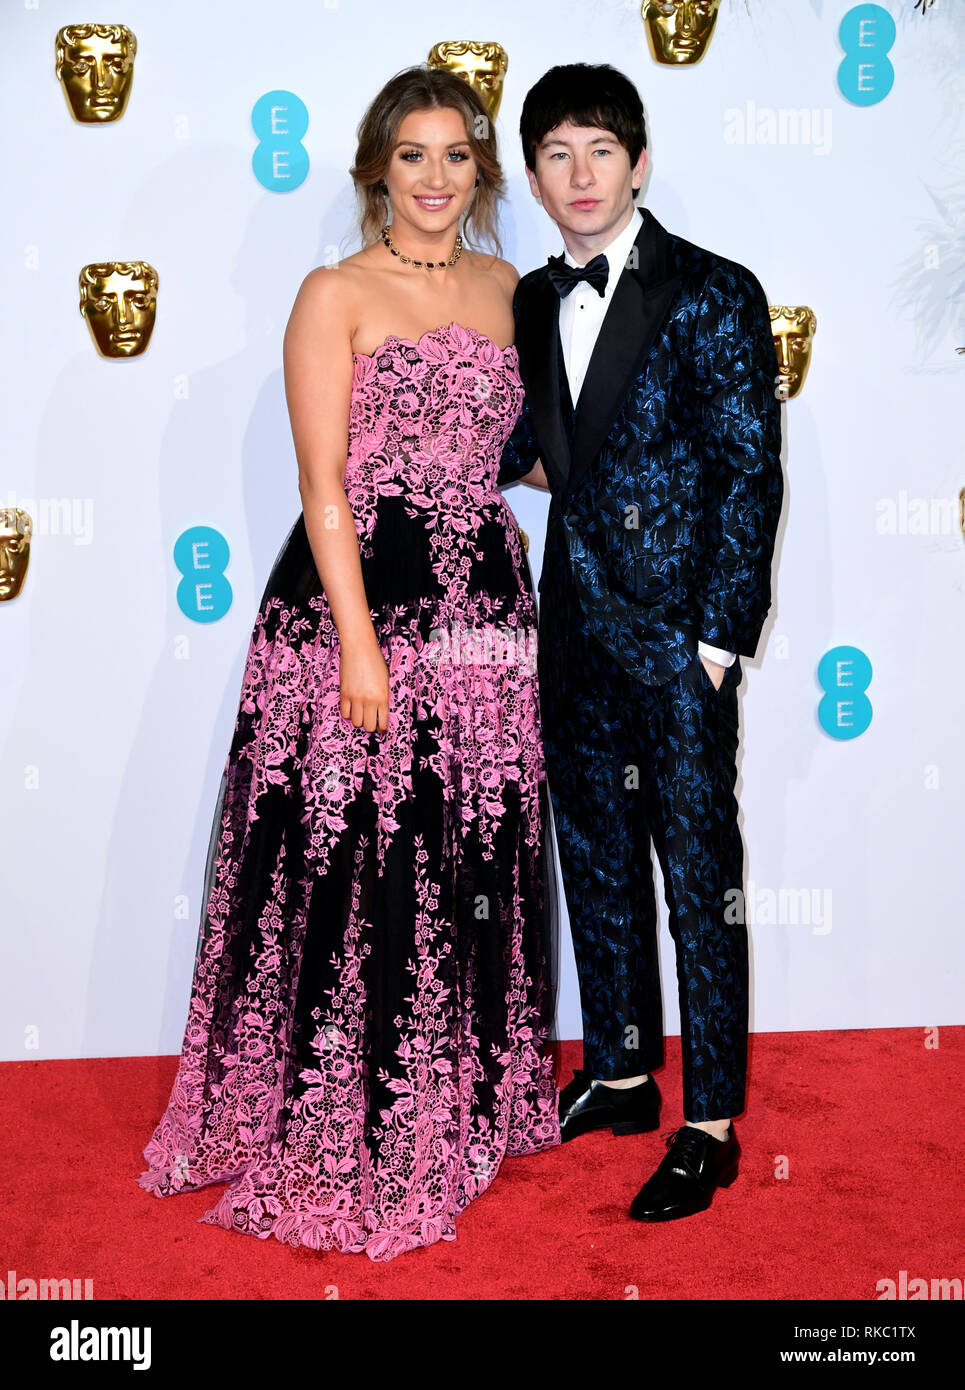 Barry Keoghan attending the 72nd British Academy Film Awards held at the Royal Albert Hall, Kensington Gore, Kensington, London. - Stock Image